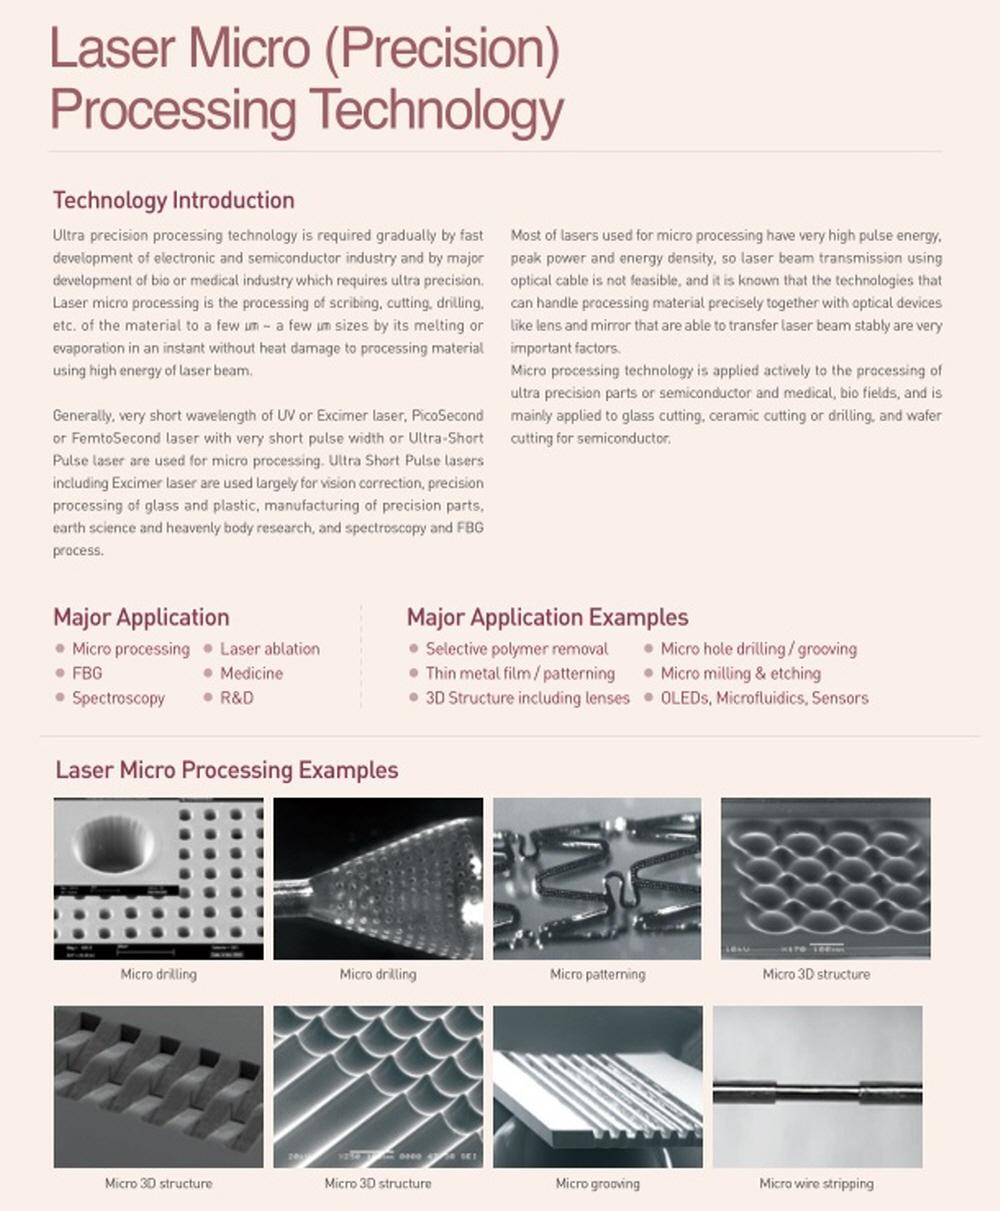 Euro Vision Laser Laser Micro(Precision) & Marking M/C